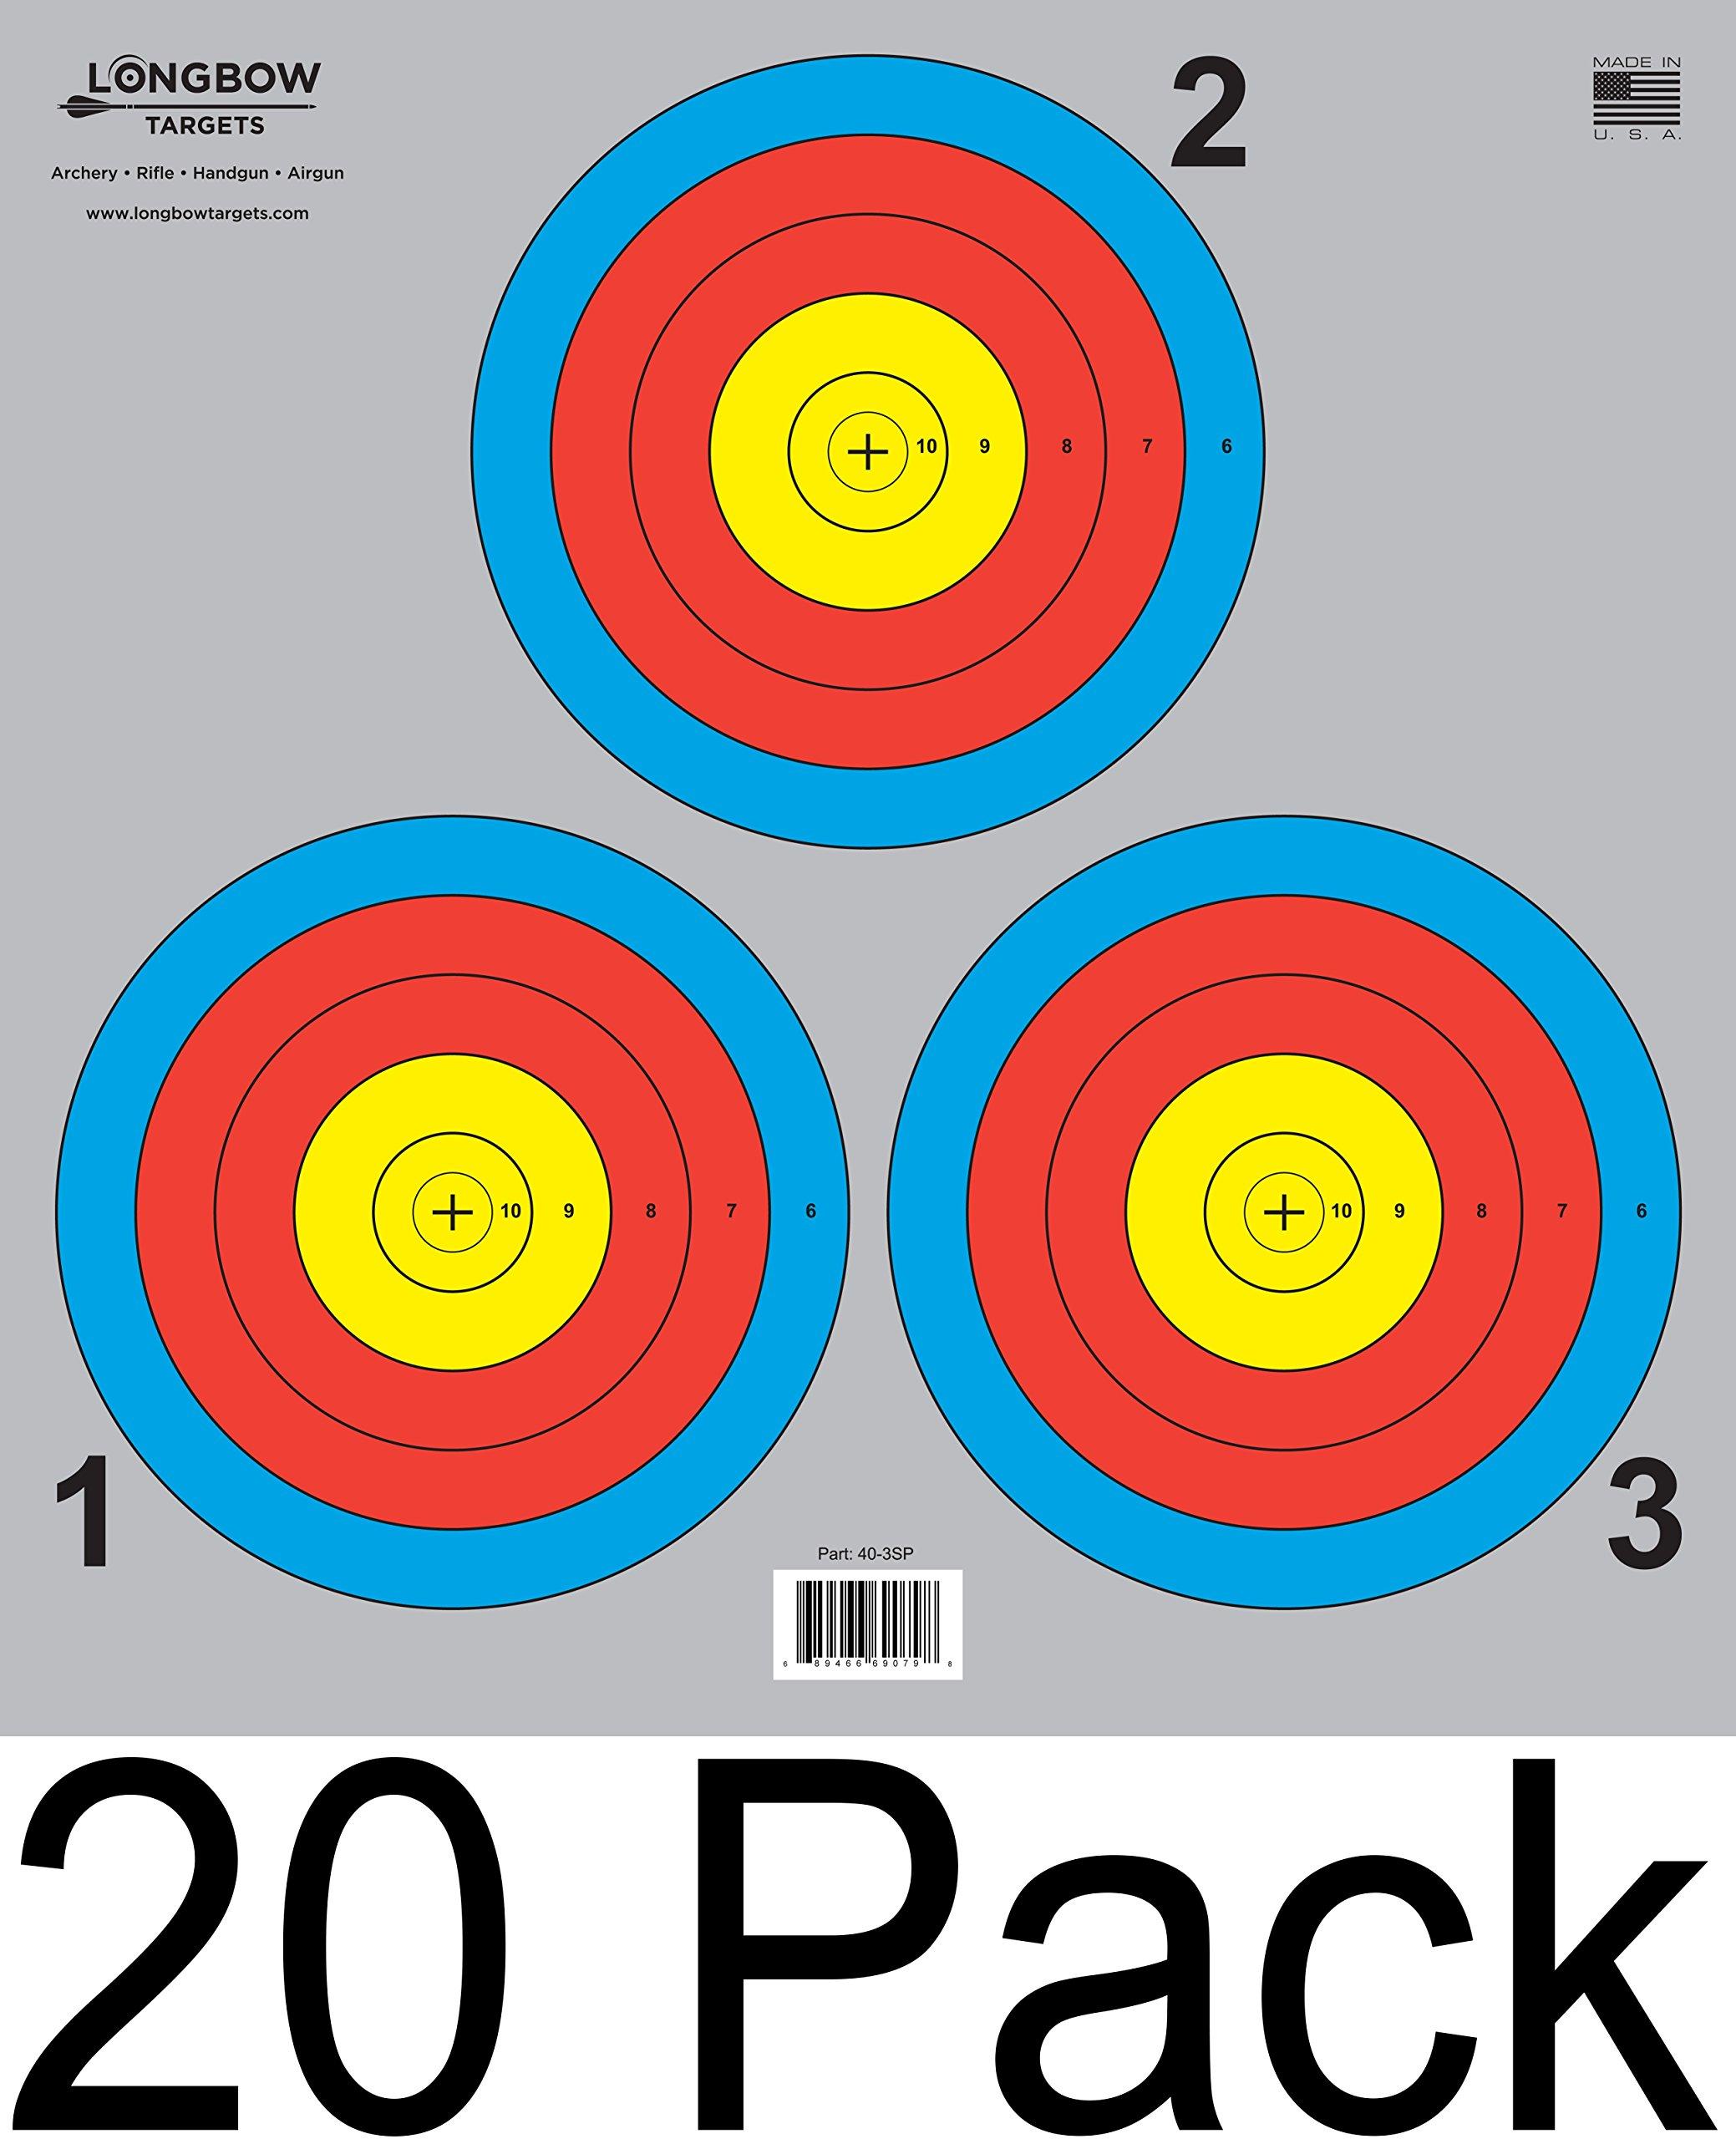 Archery 5 SPOT & 3 SPOT Vegas Targets by Longbow 8, 20, 50 & 200 Packs (3 Spot (20 Pack))